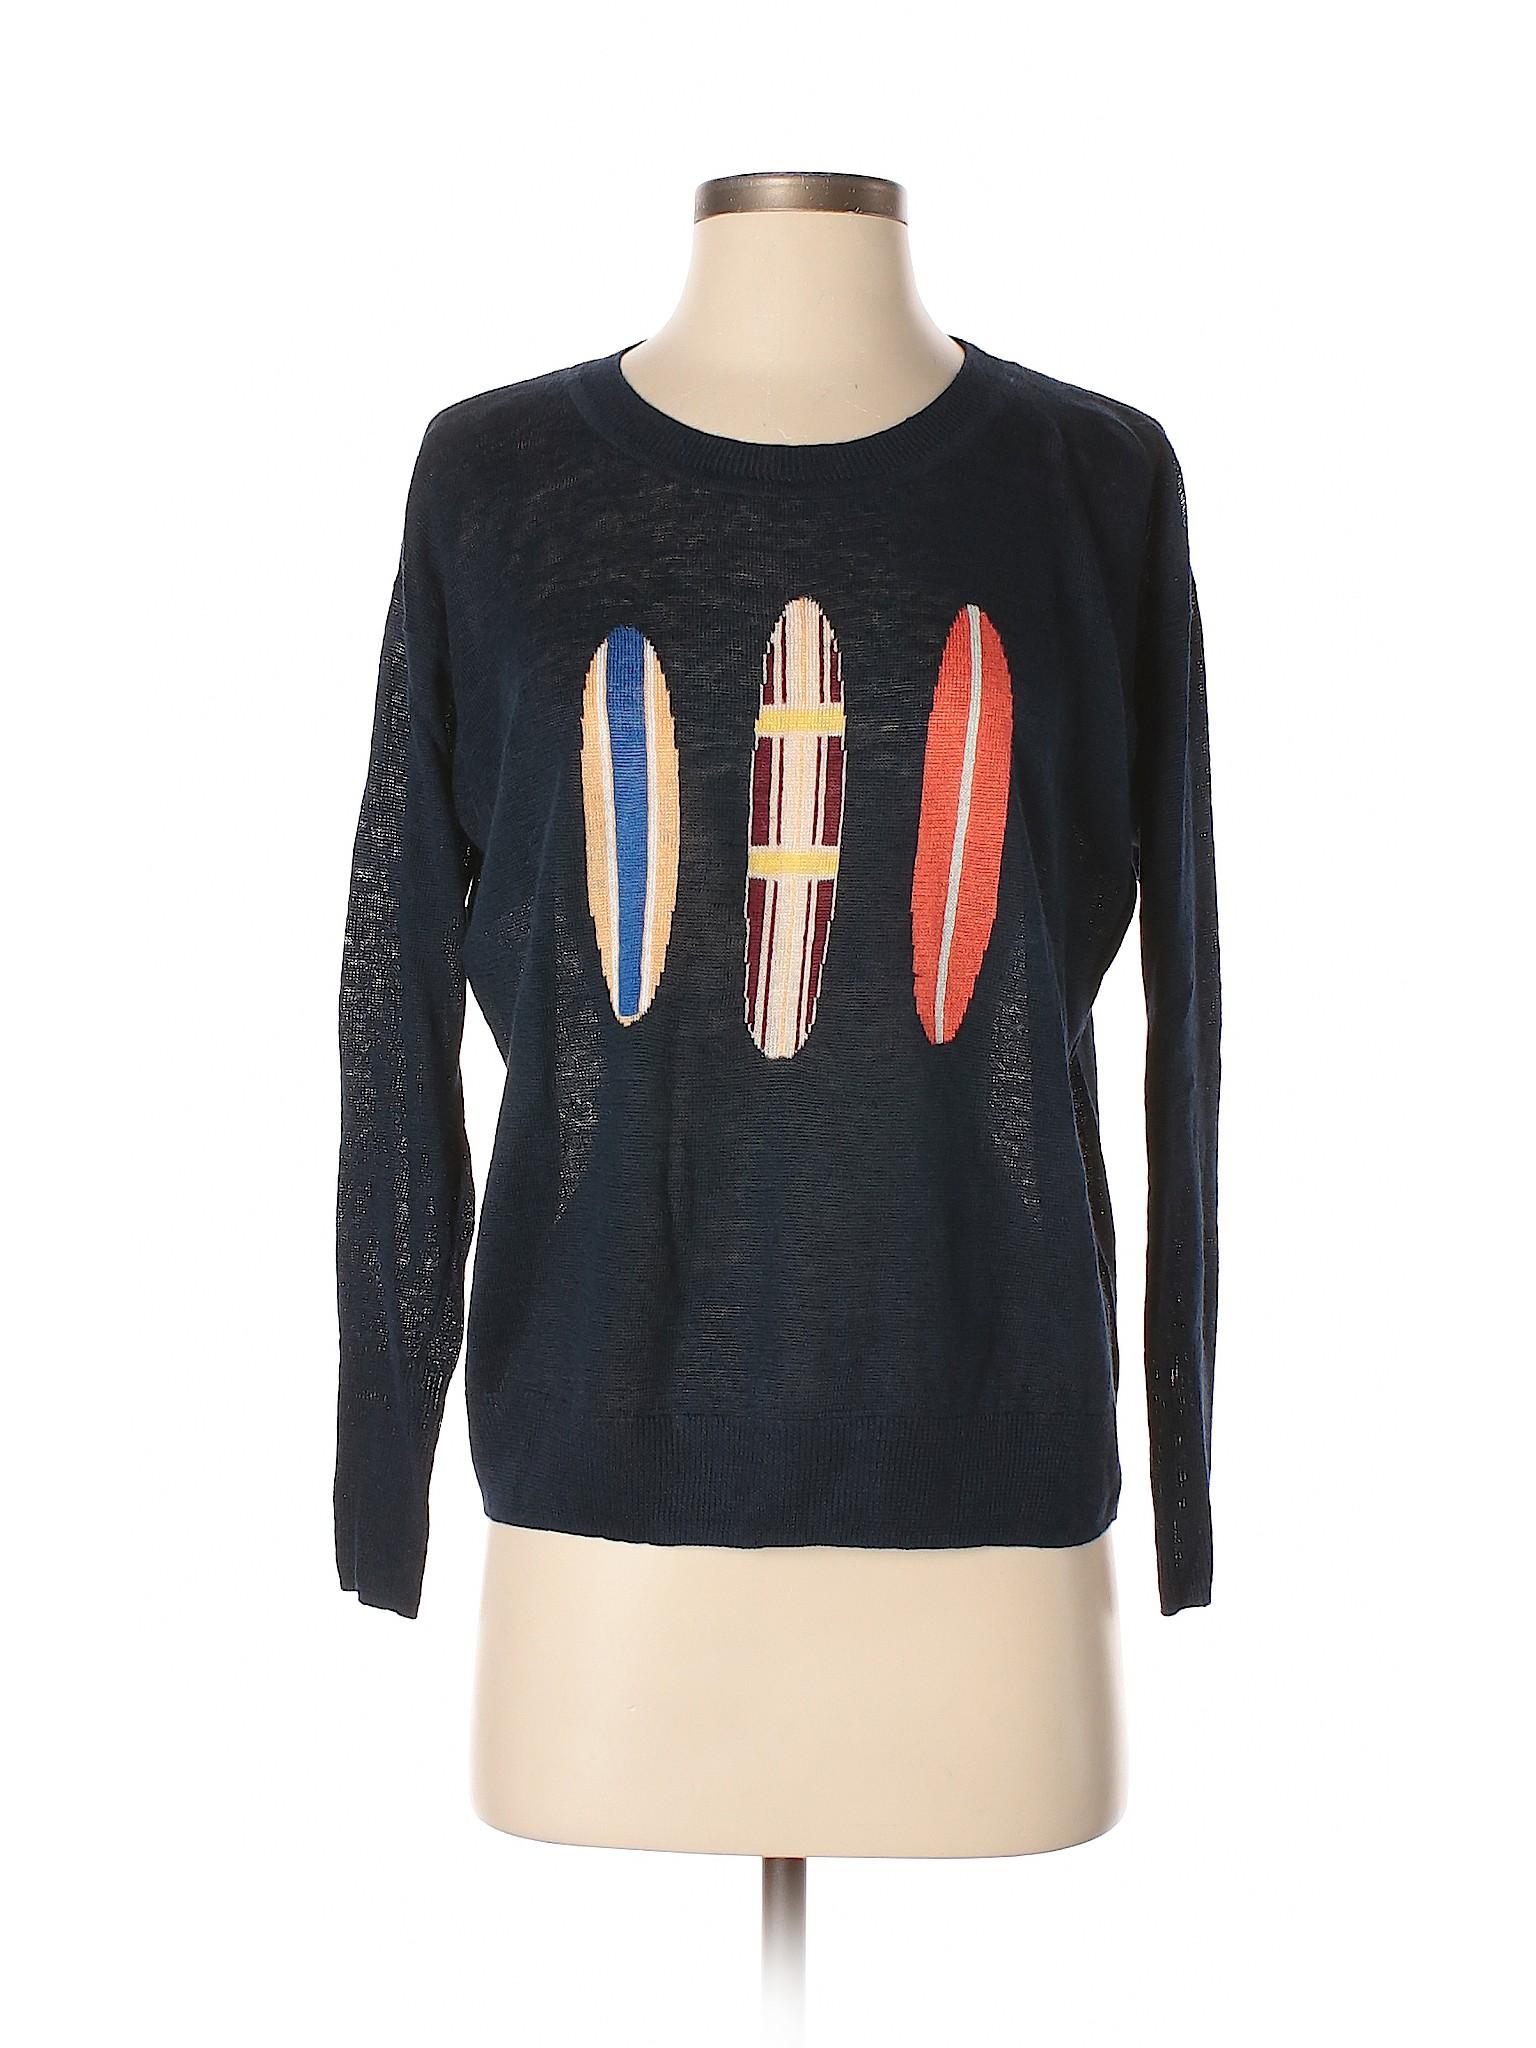 Crew J Sweater winter Pullover Boutique EUHWg6qX